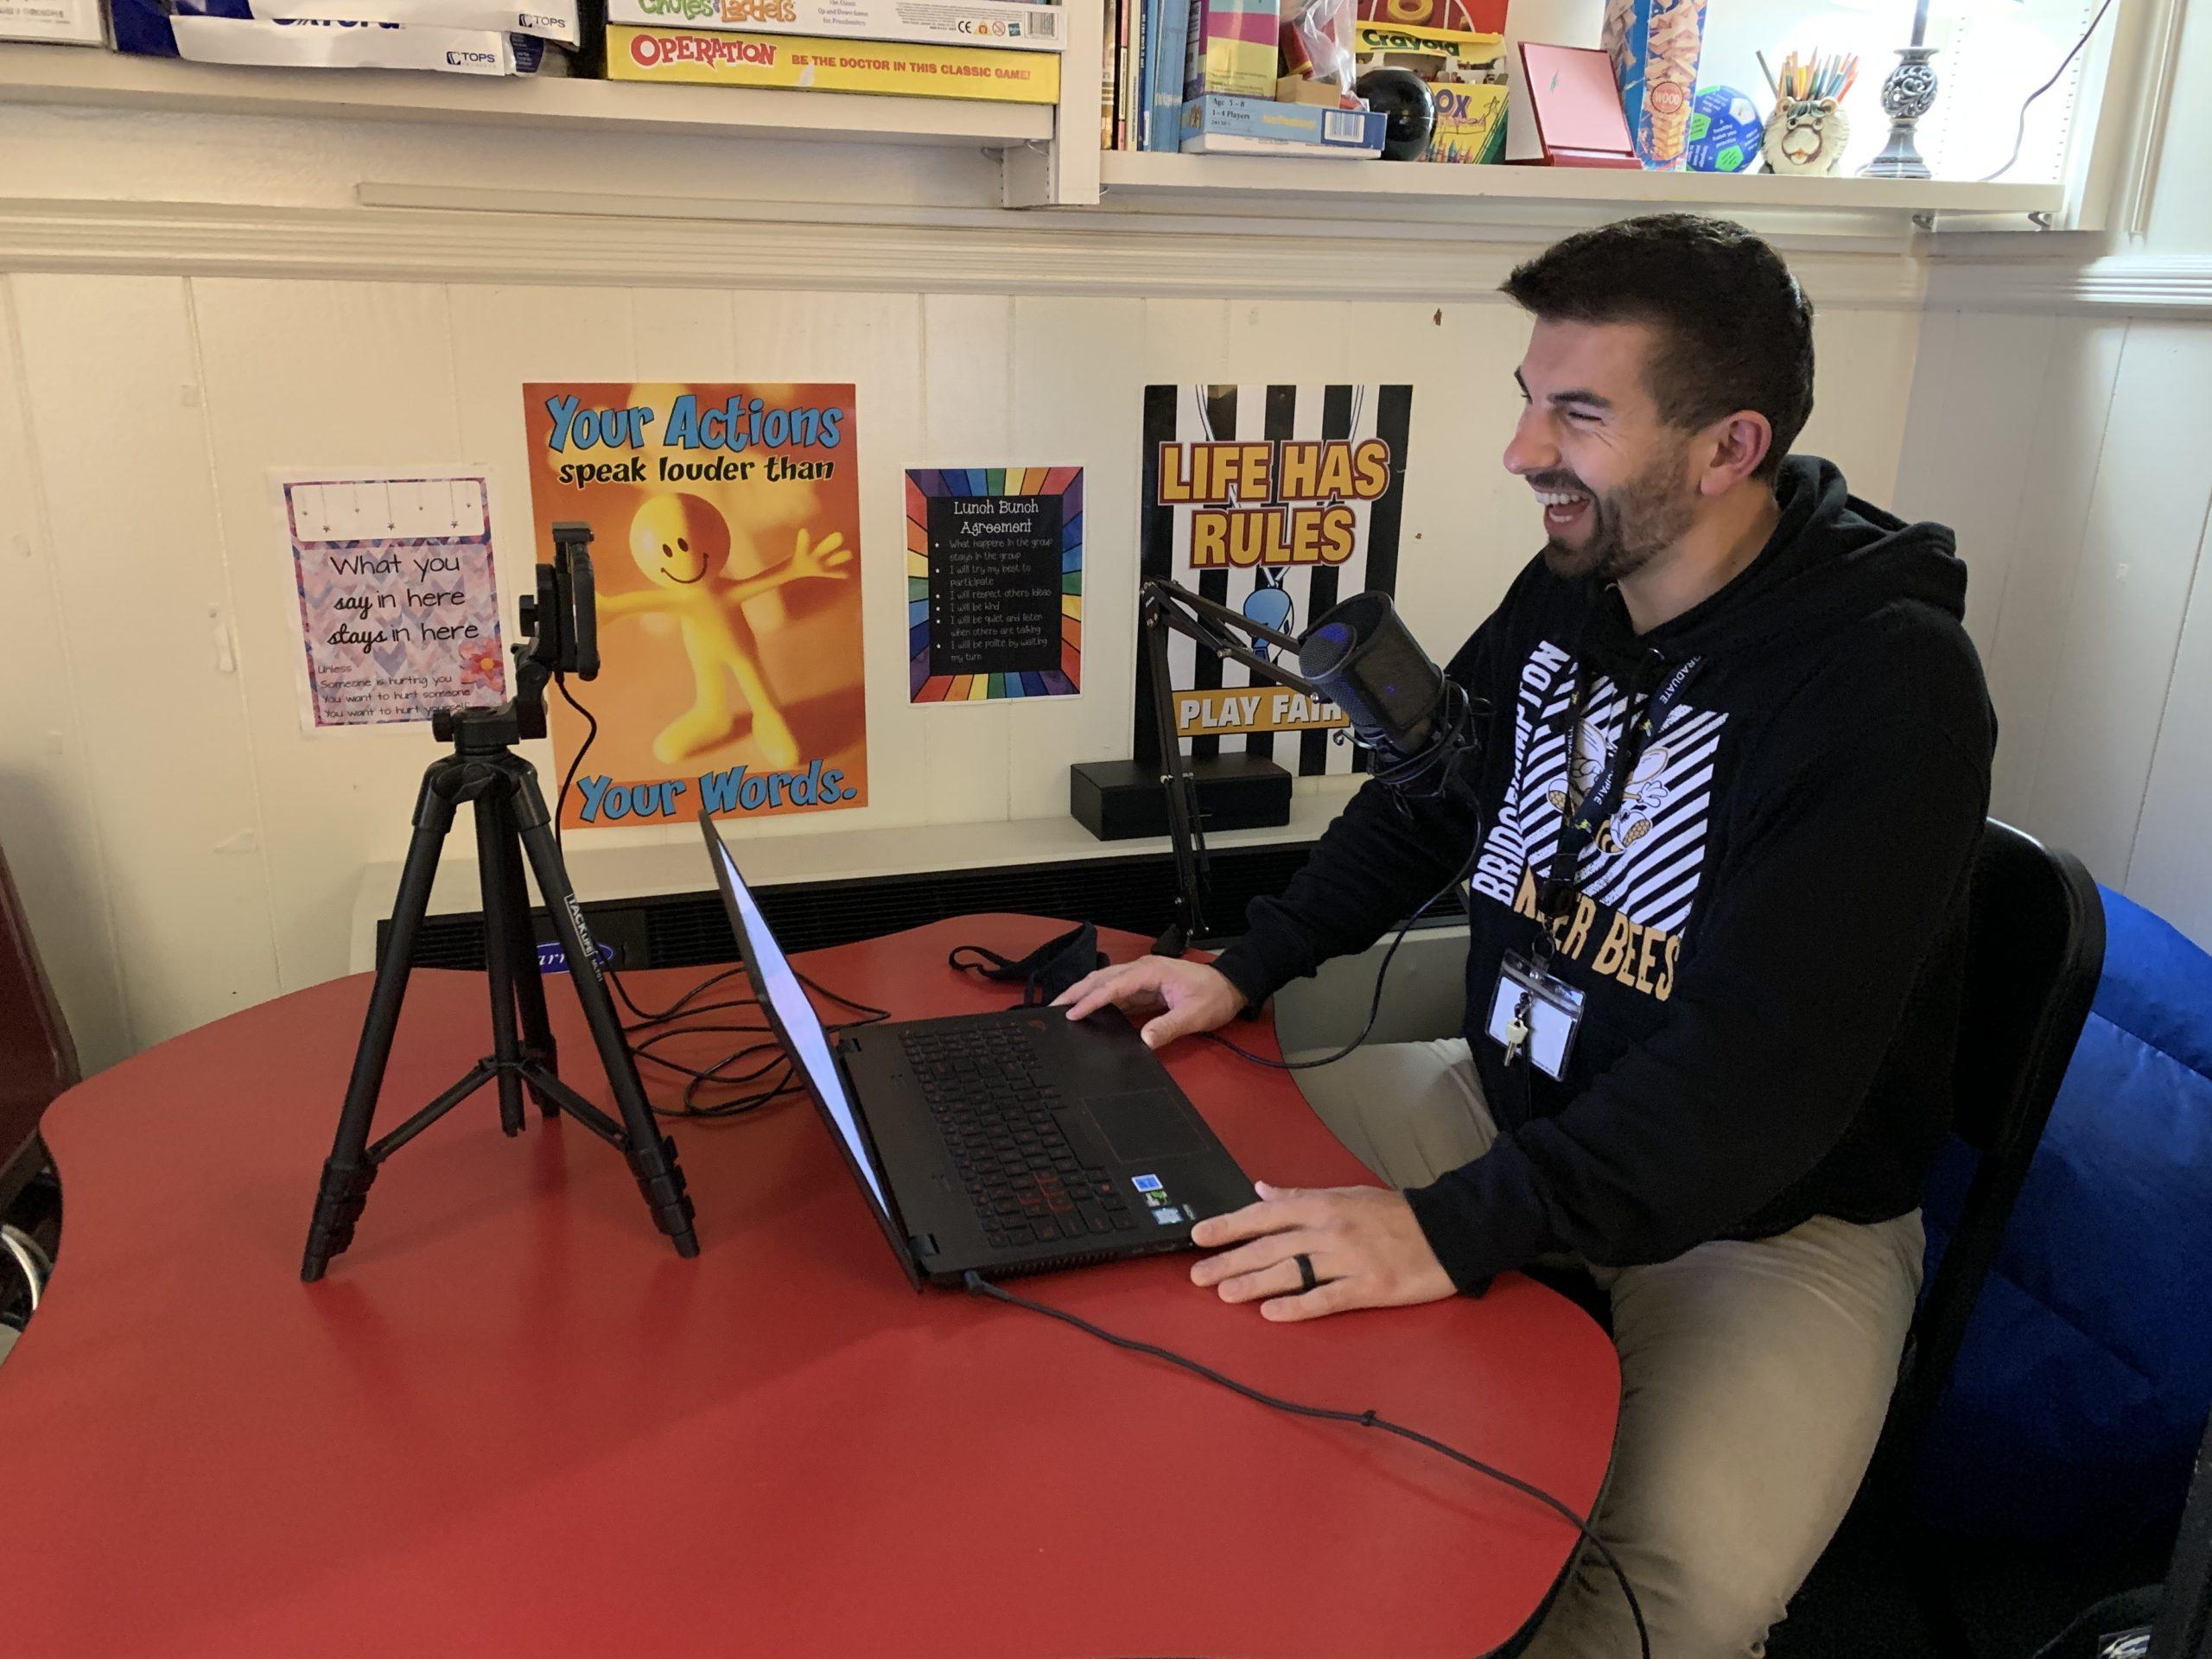 Elementary school guidance counselor Ryan Barker is the host of the Bridgehampton School's morning announcements. COURTESY BRIDGEHAMPTON SCHOOL